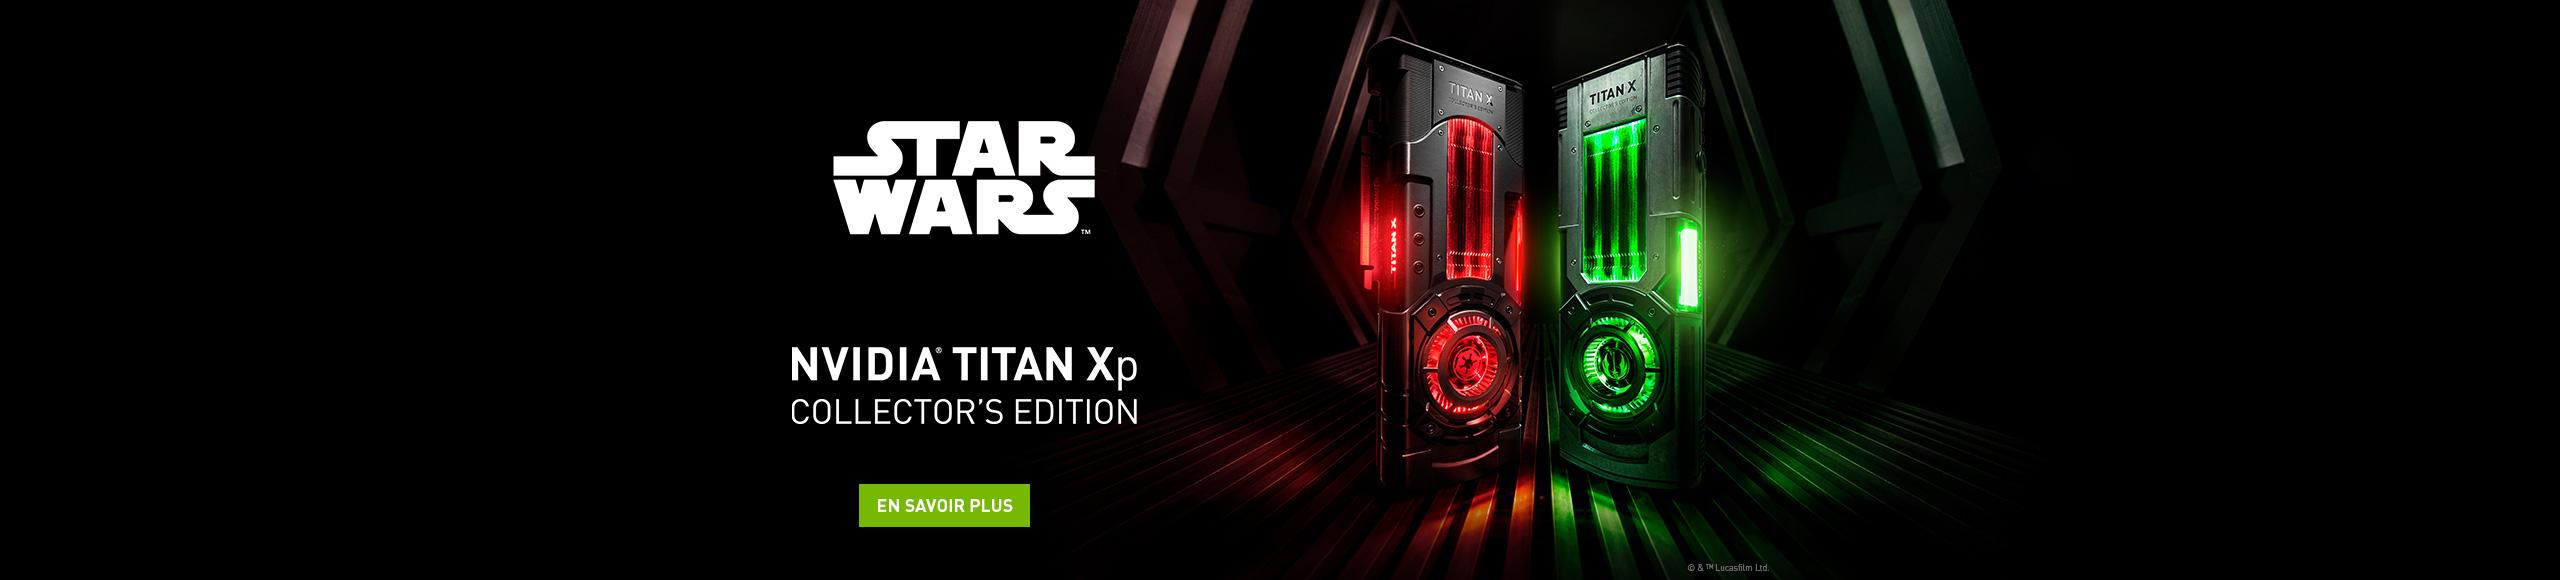 MFGFX_1_Titan_Xp_Star_Wars